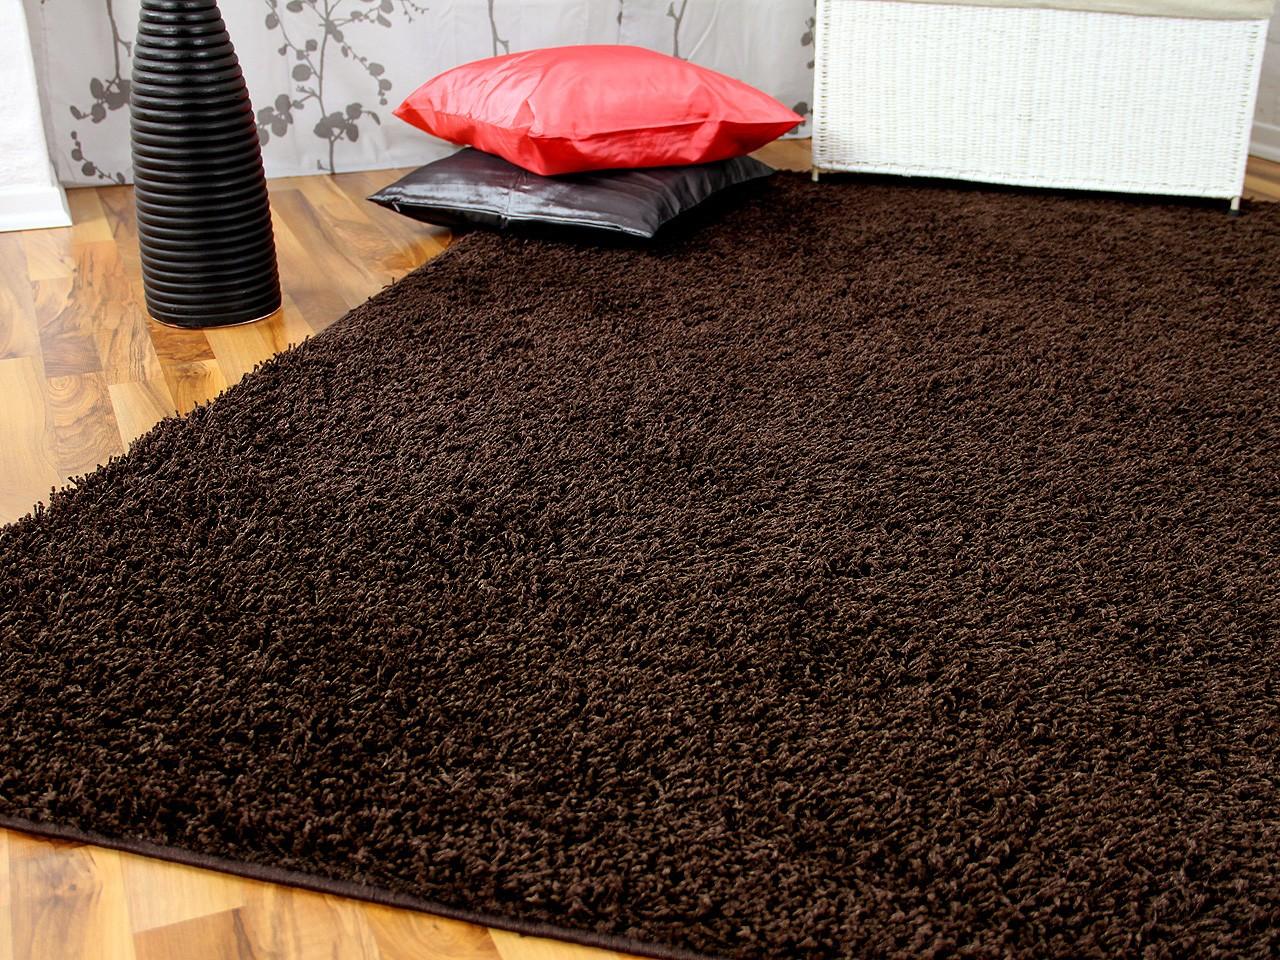 hochflor langflor teppich shaggy nova braun teppiche hochflor langflor teppiche braun und choco. Black Bedroom Furniture Sets. Home Design Ideas